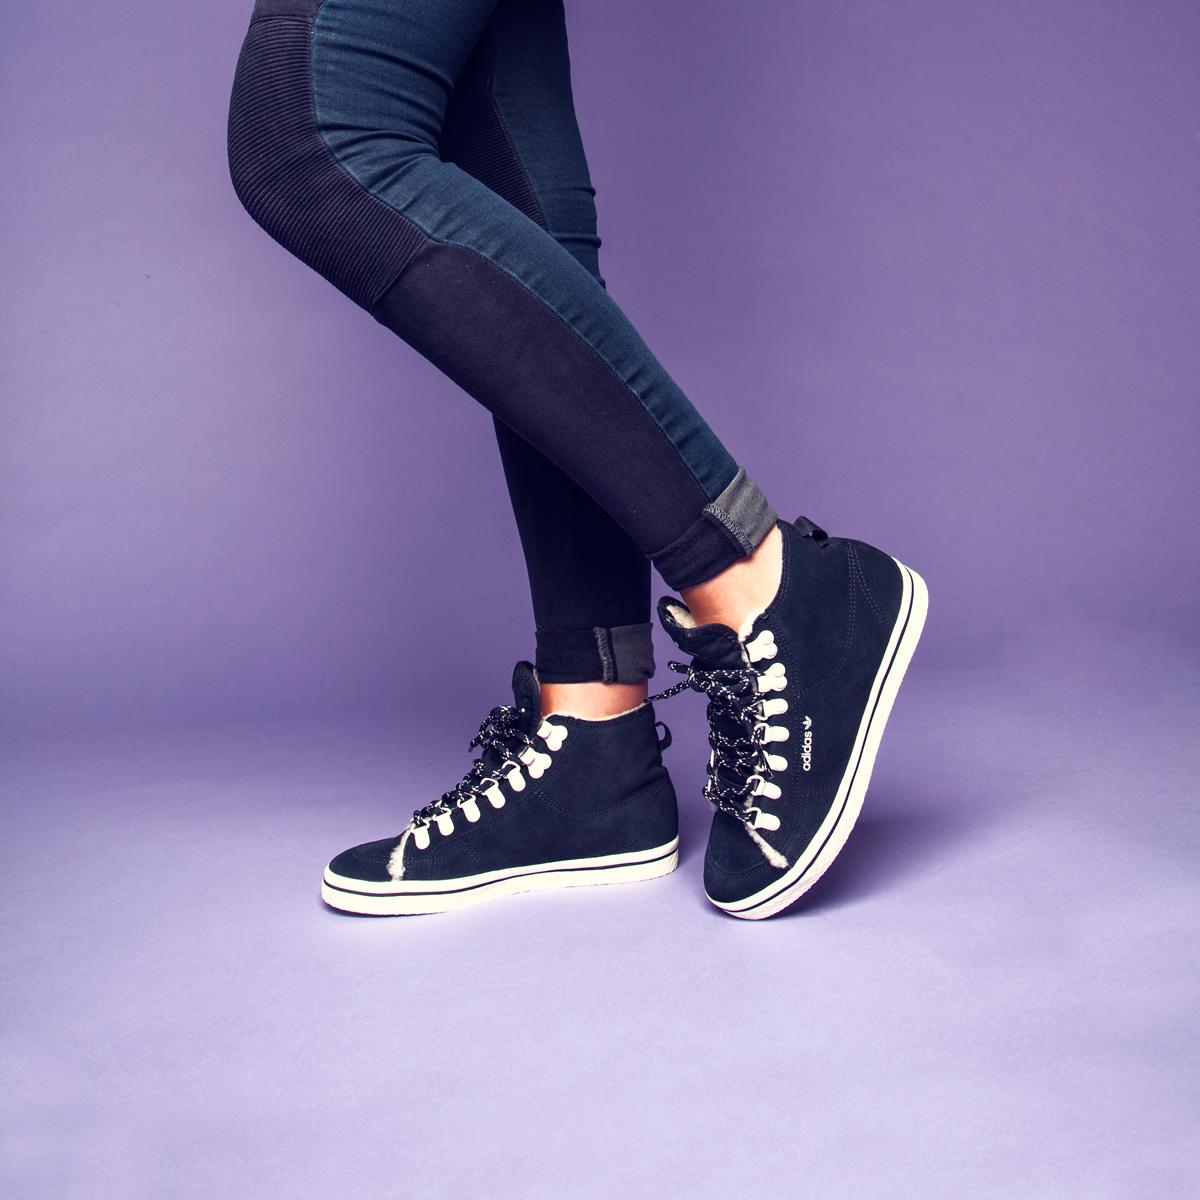 Adidas Honey Hook Trainers | Hi Tops | Kid shoes, Adidas